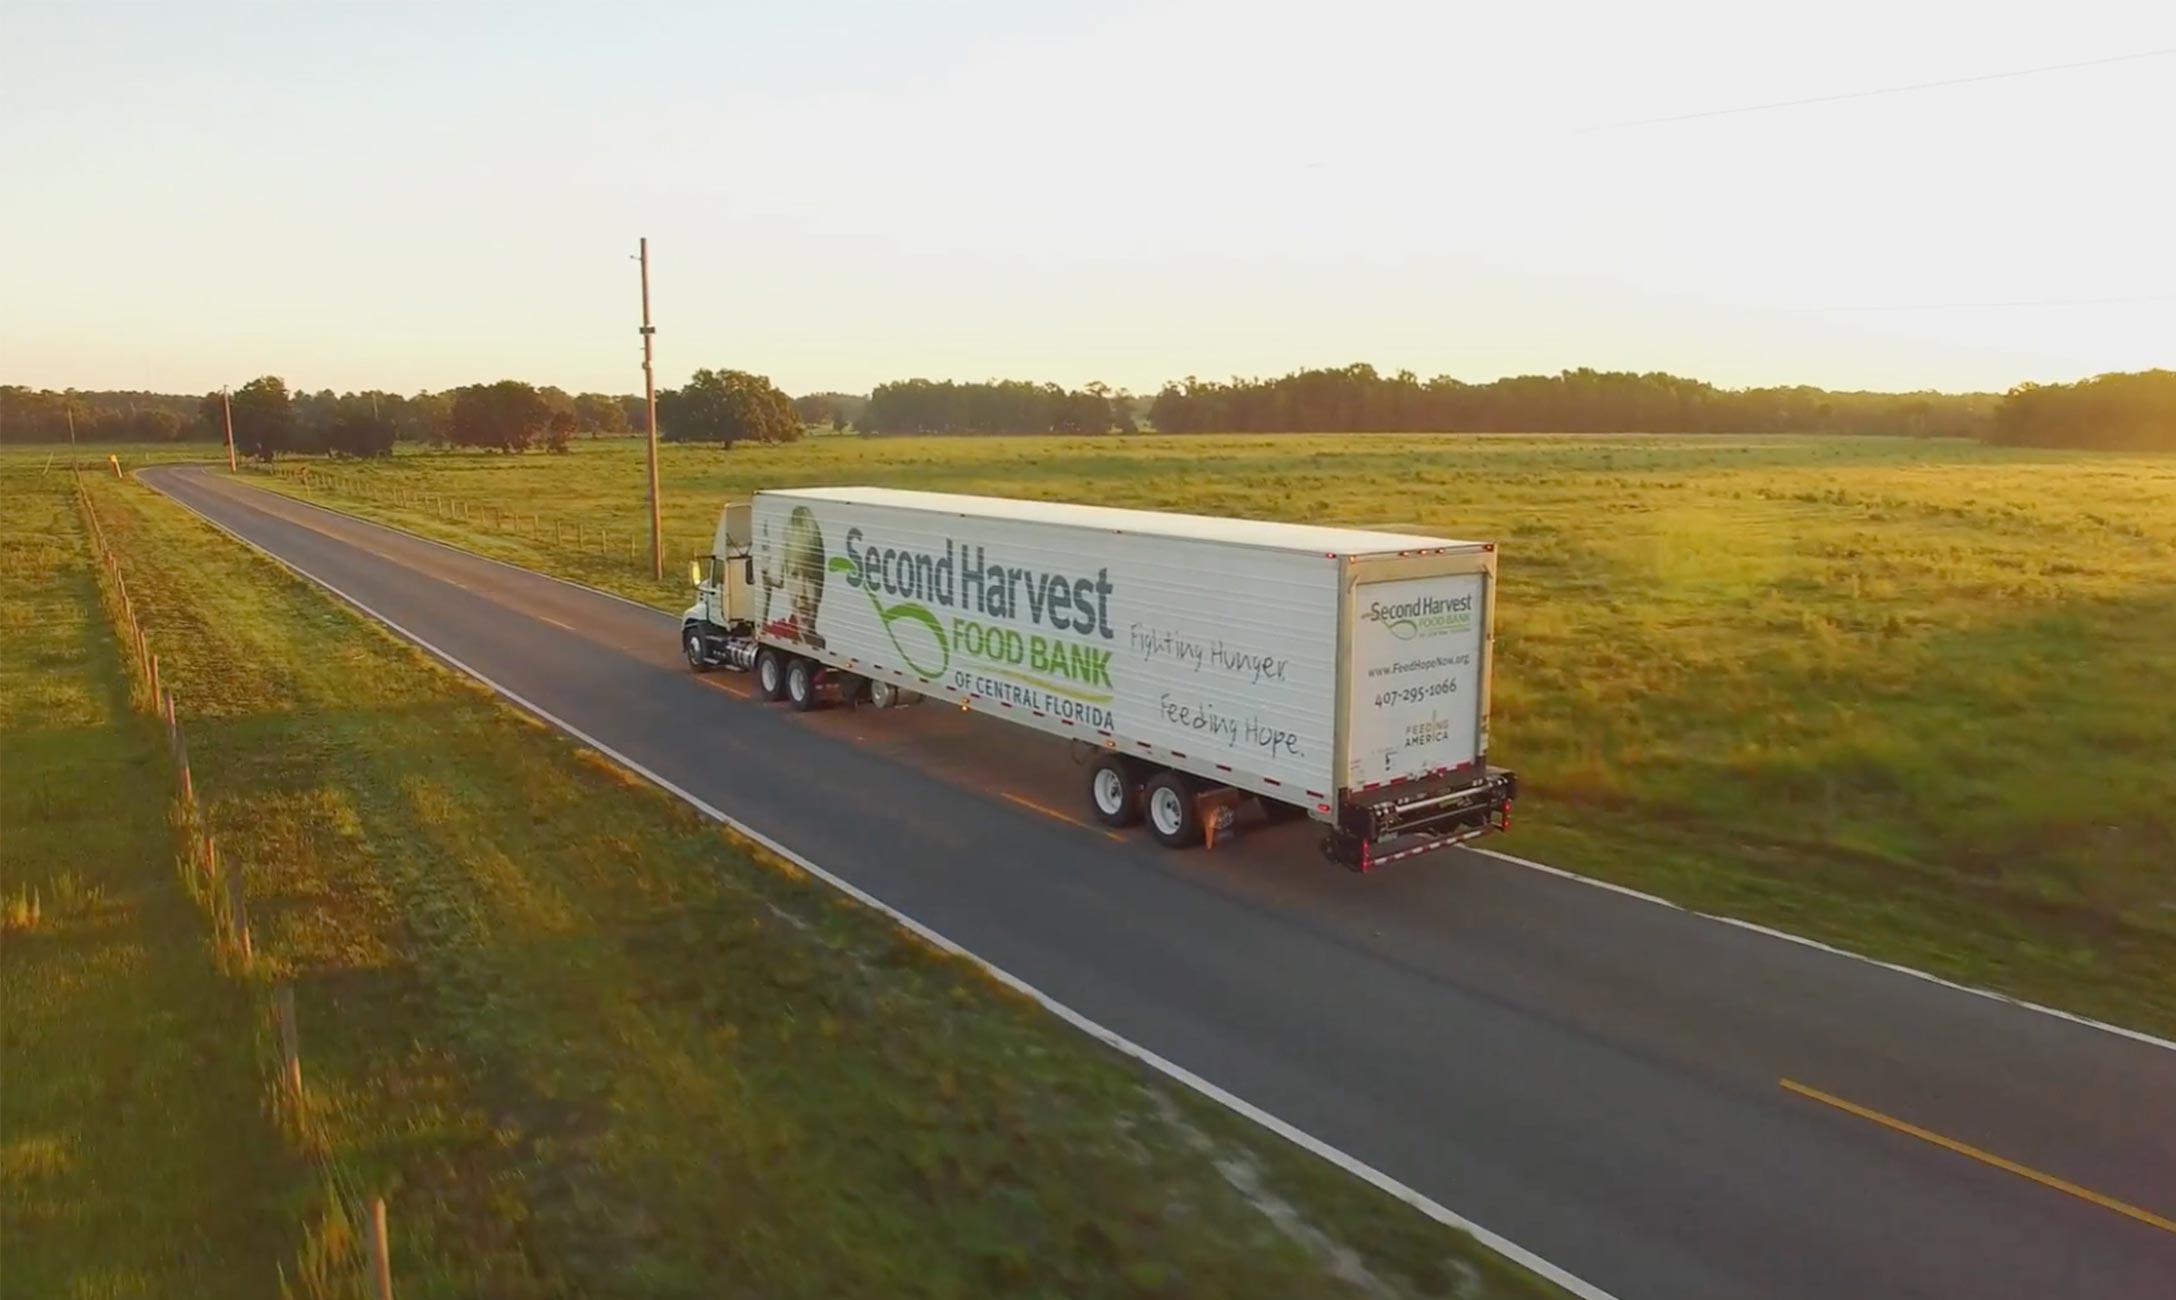 Second Harvest semi-truck driving on flat road.